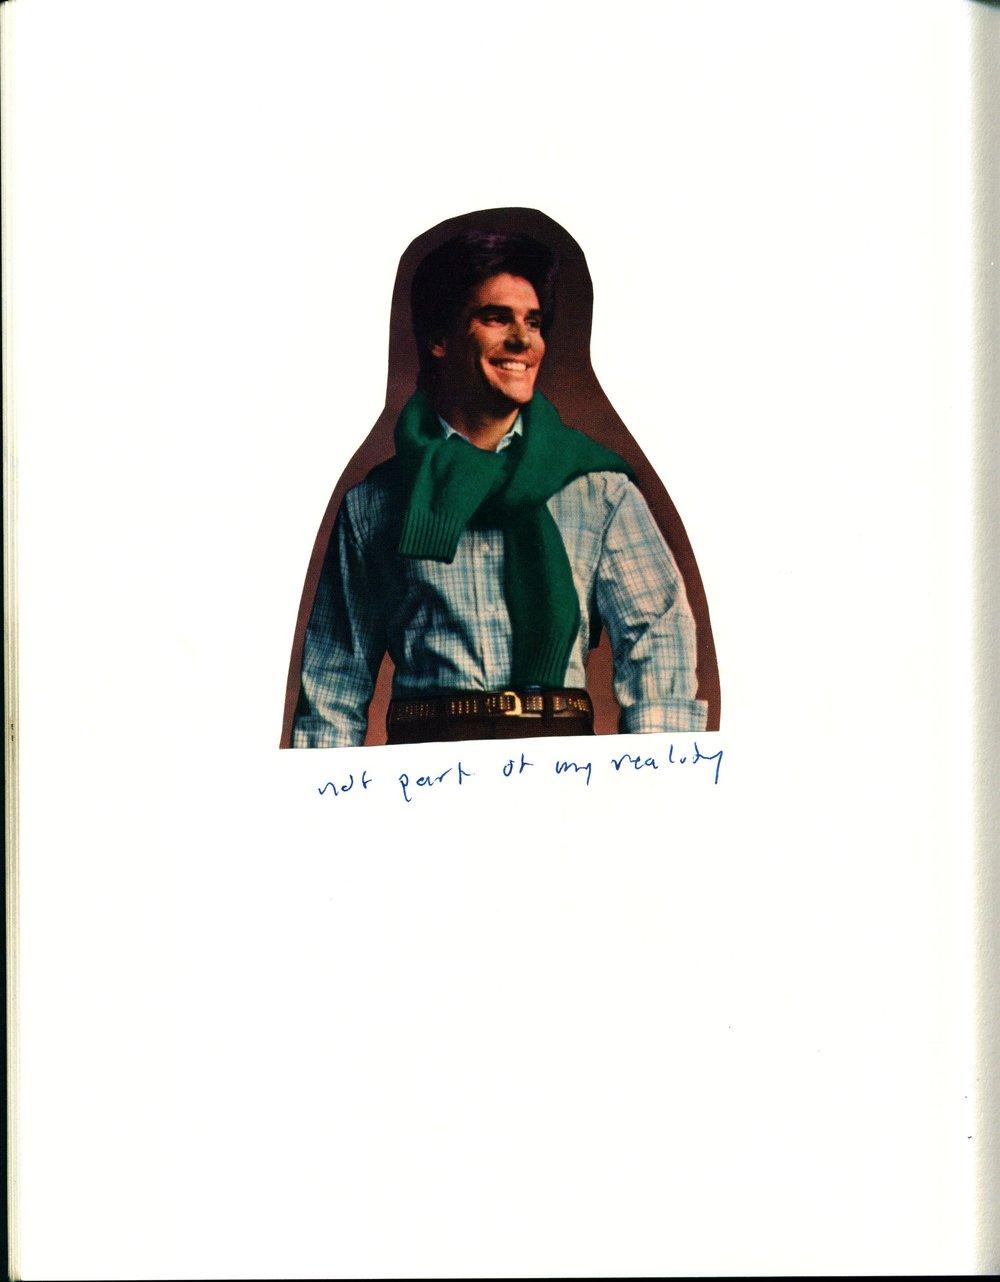 notebook0017.jpg